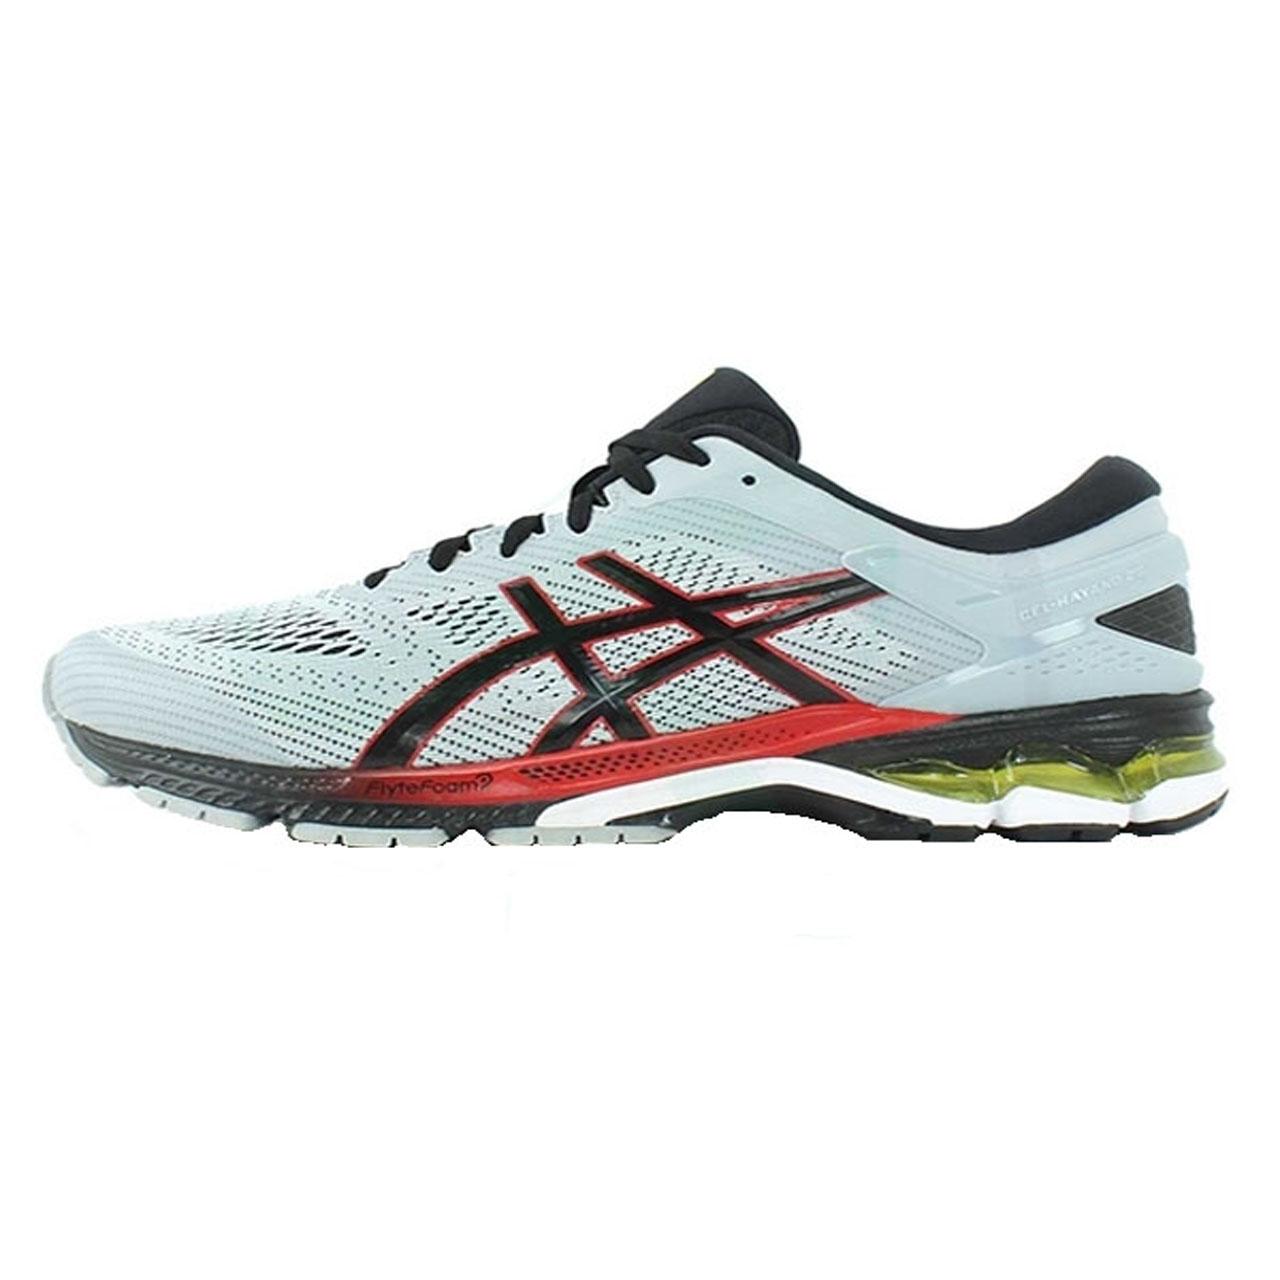 کفش مخصوص دویدن مردانه اسیکس مدل Gel-kayano 26-1011A542